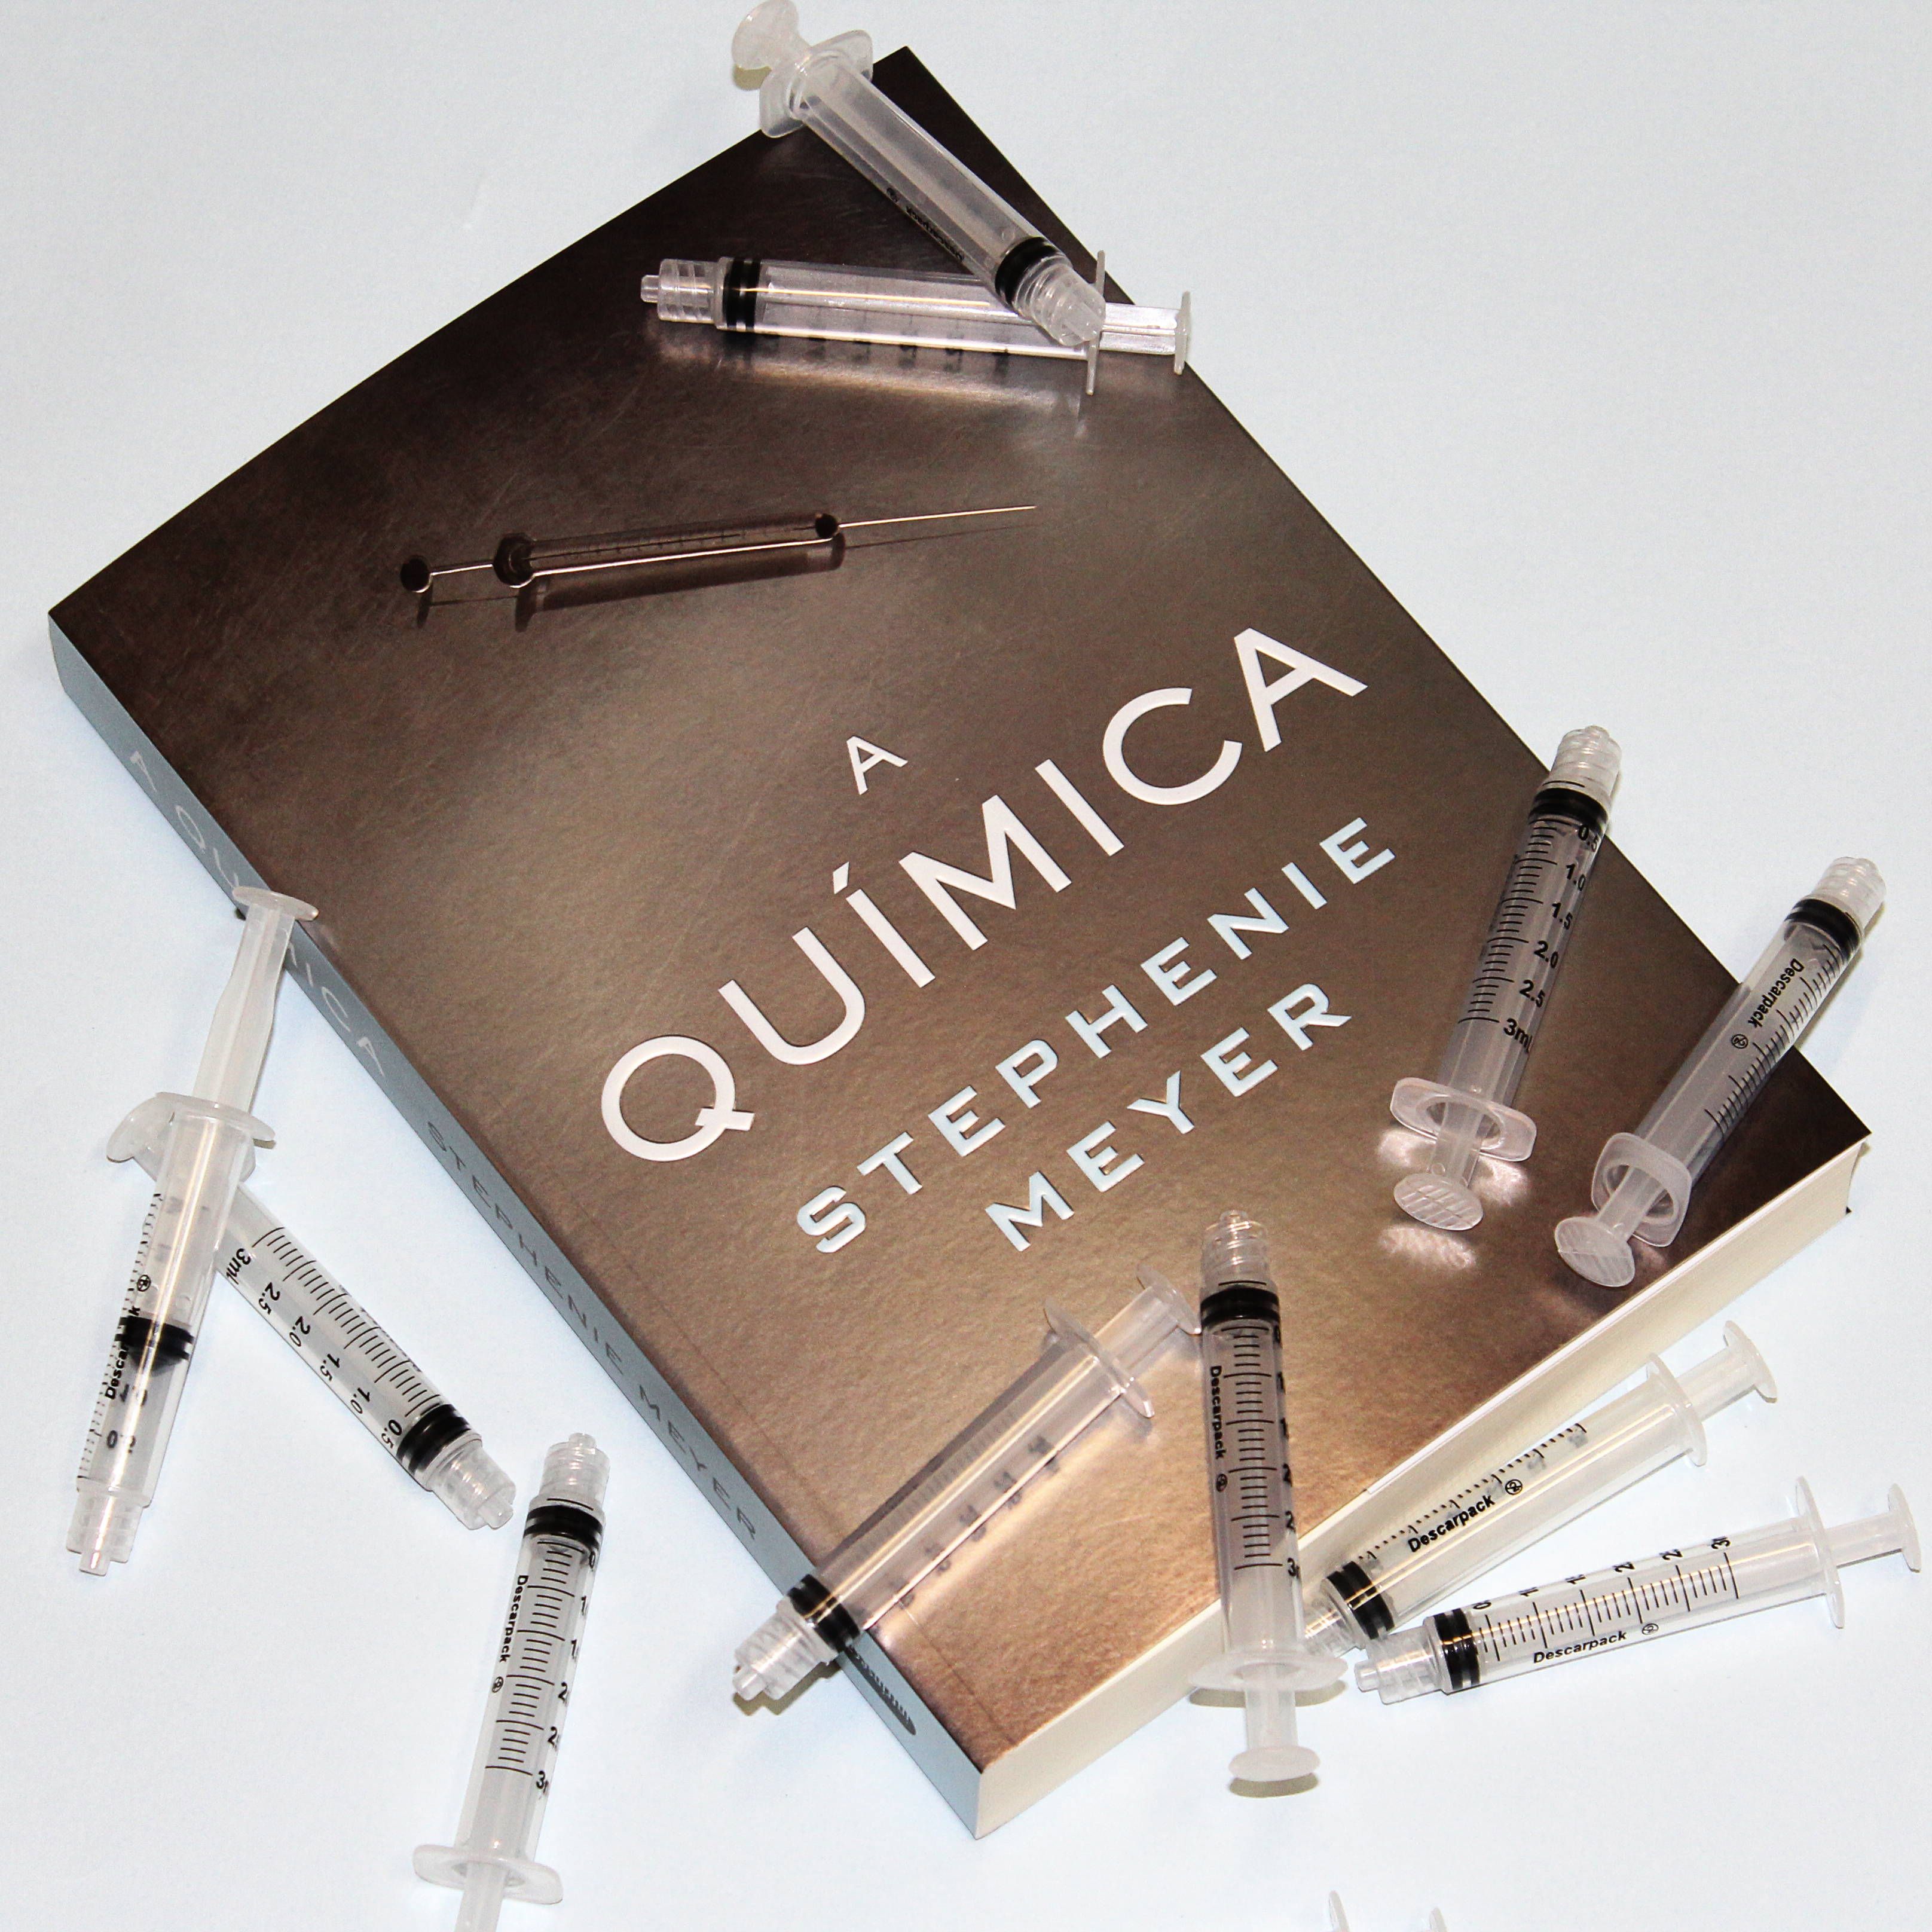 a-quimica-chegada-de-grafica-quad